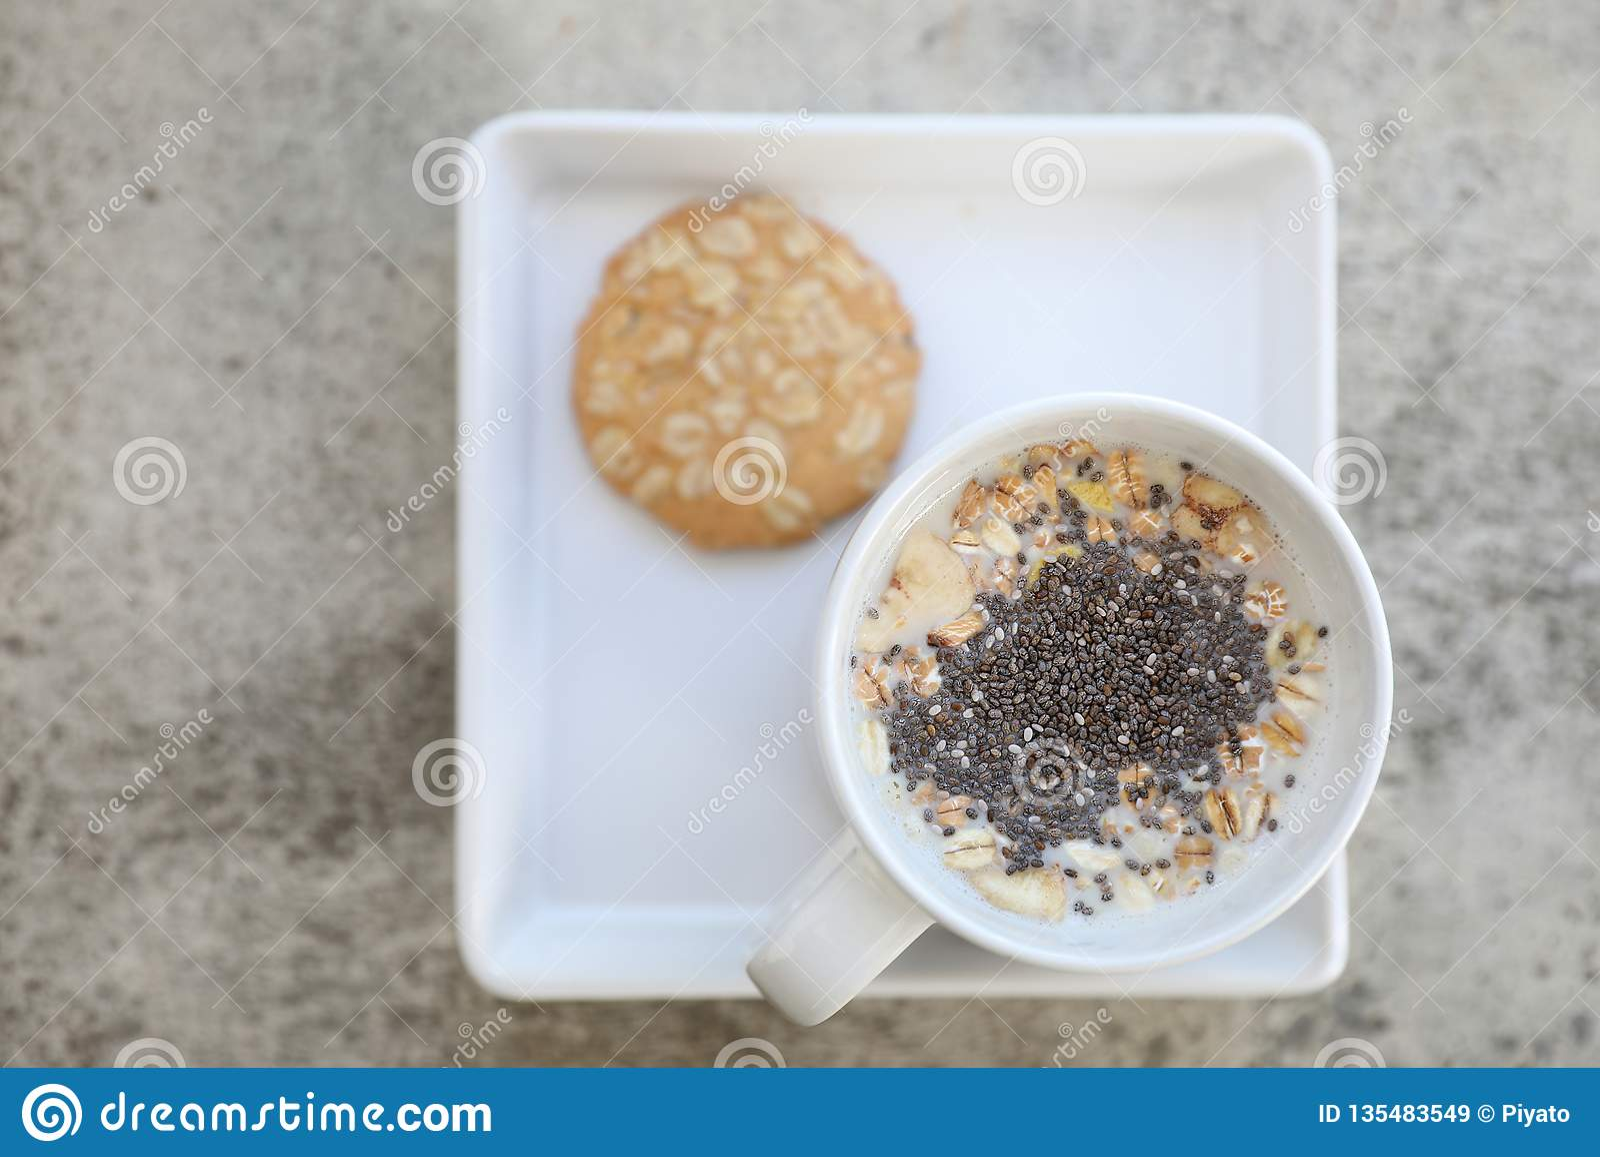 Graangewas op melk in kop en koekje